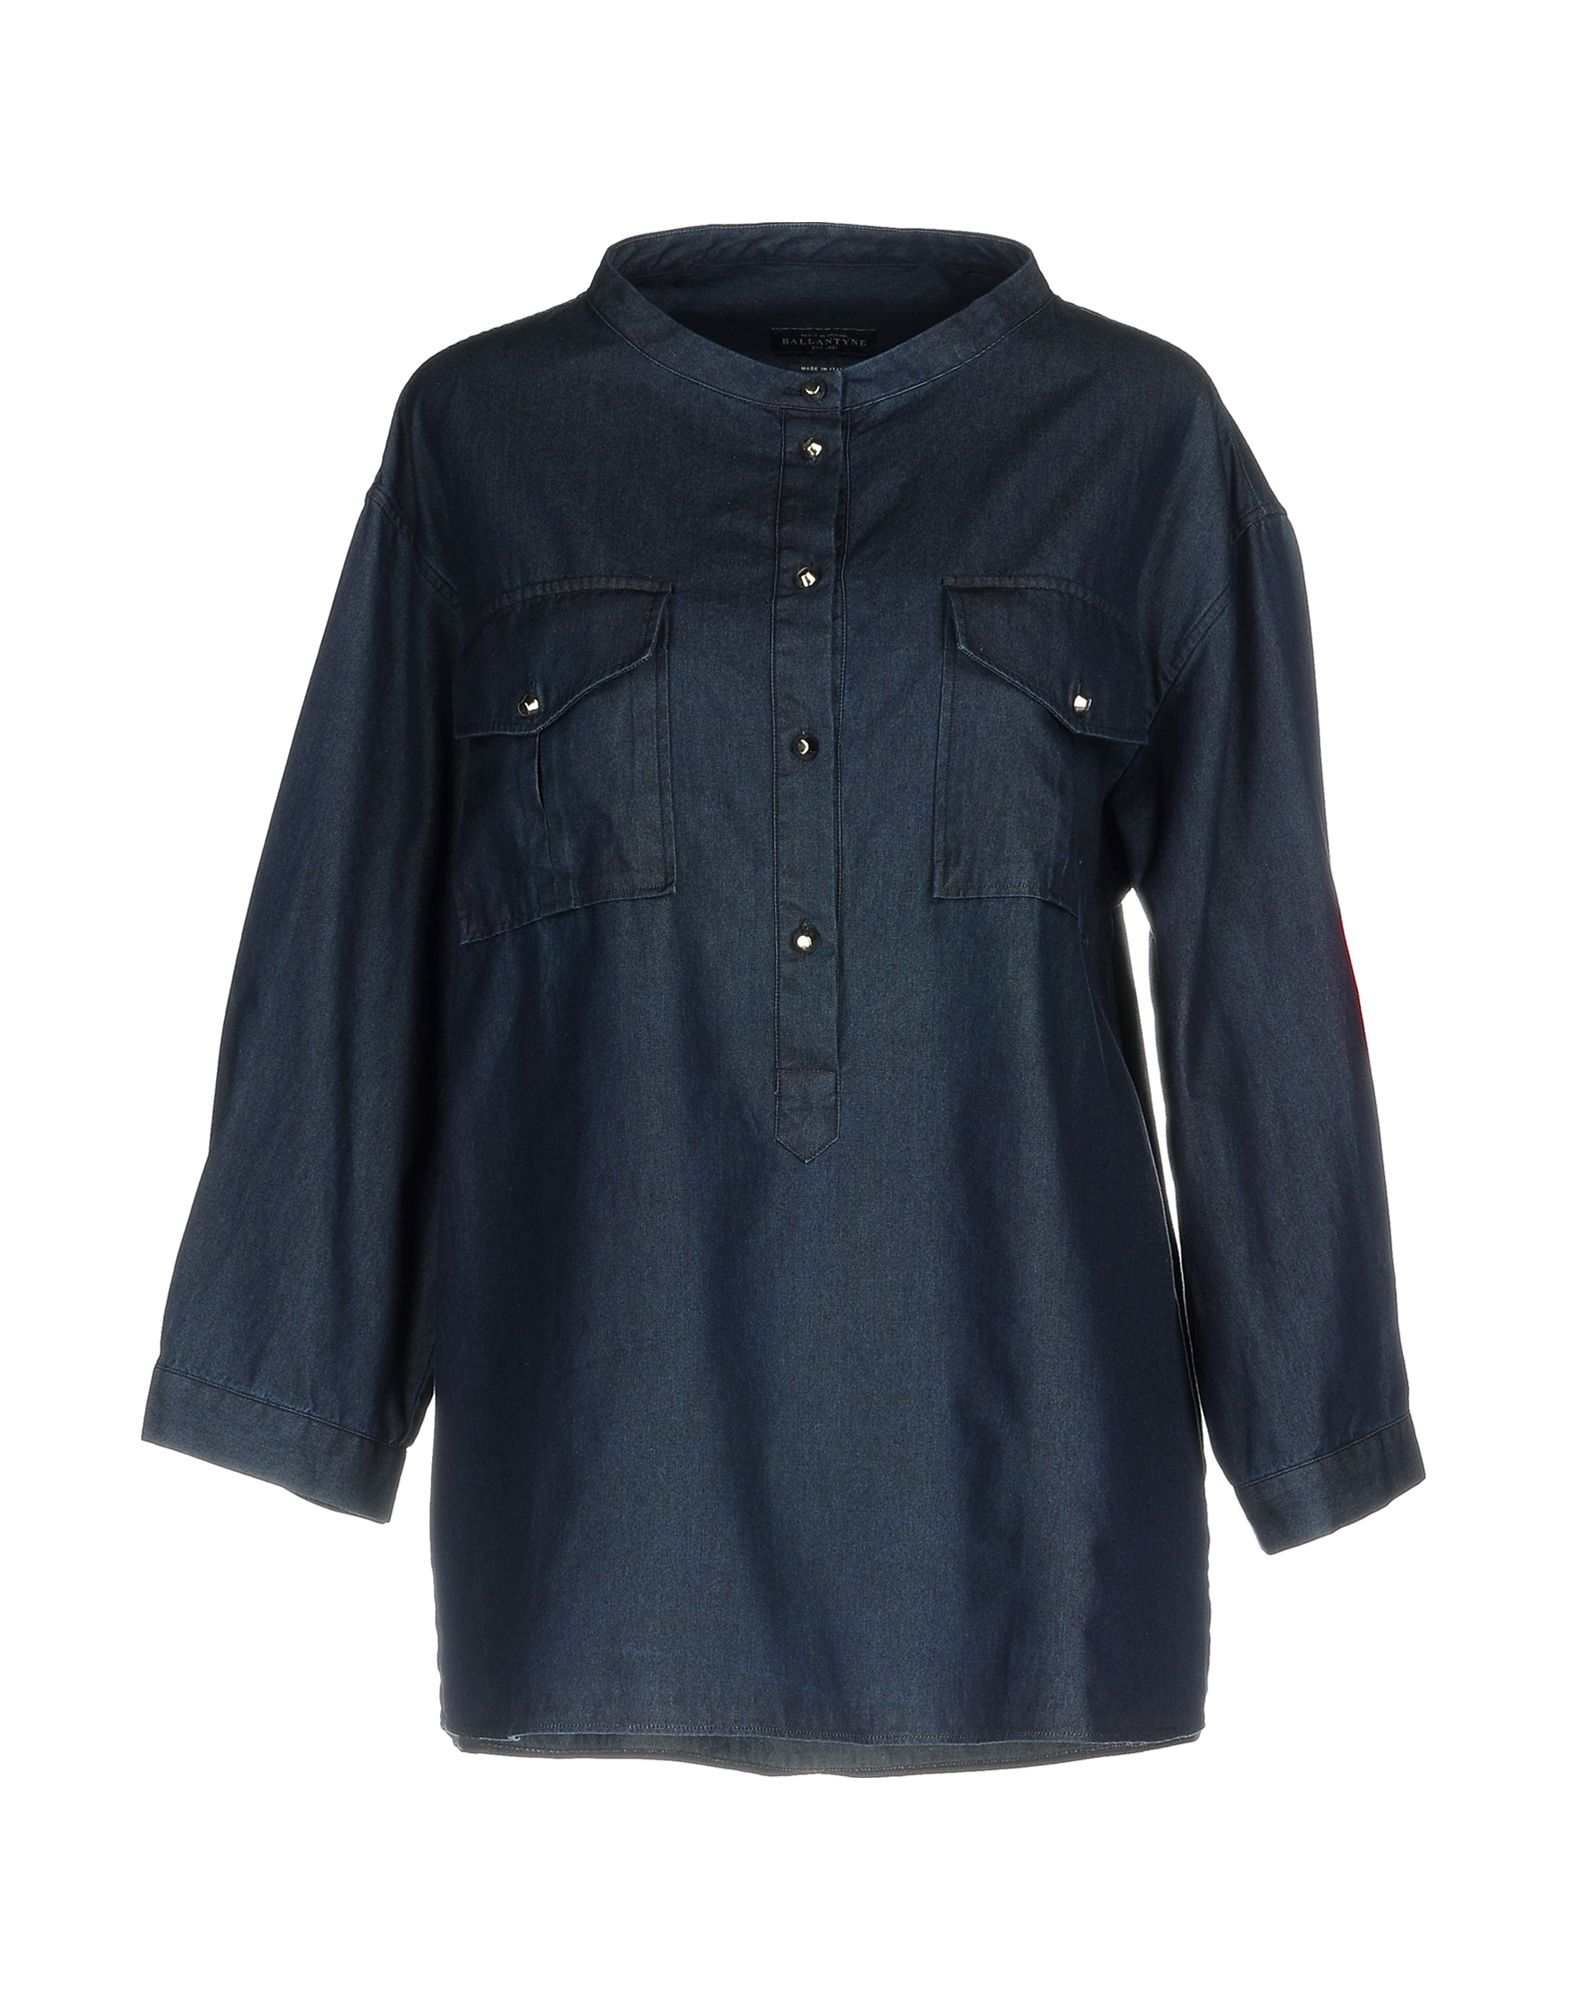 BALLANTYNE Джинсовая рубашка